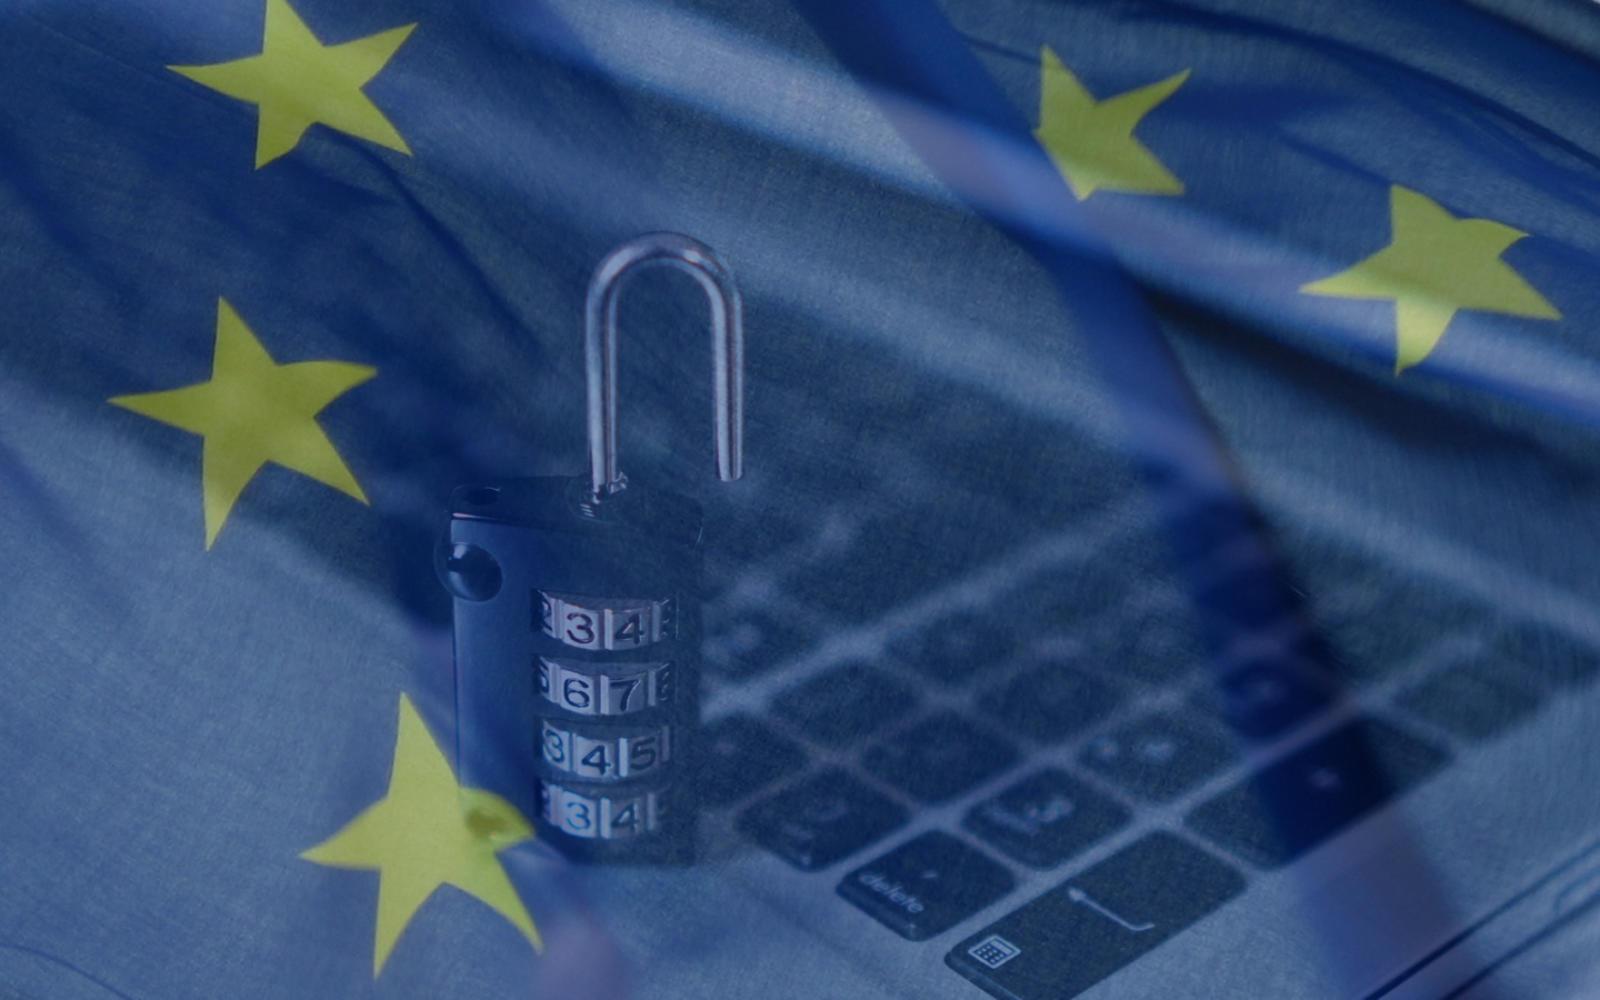 EU flag overlay with laptop and padlock